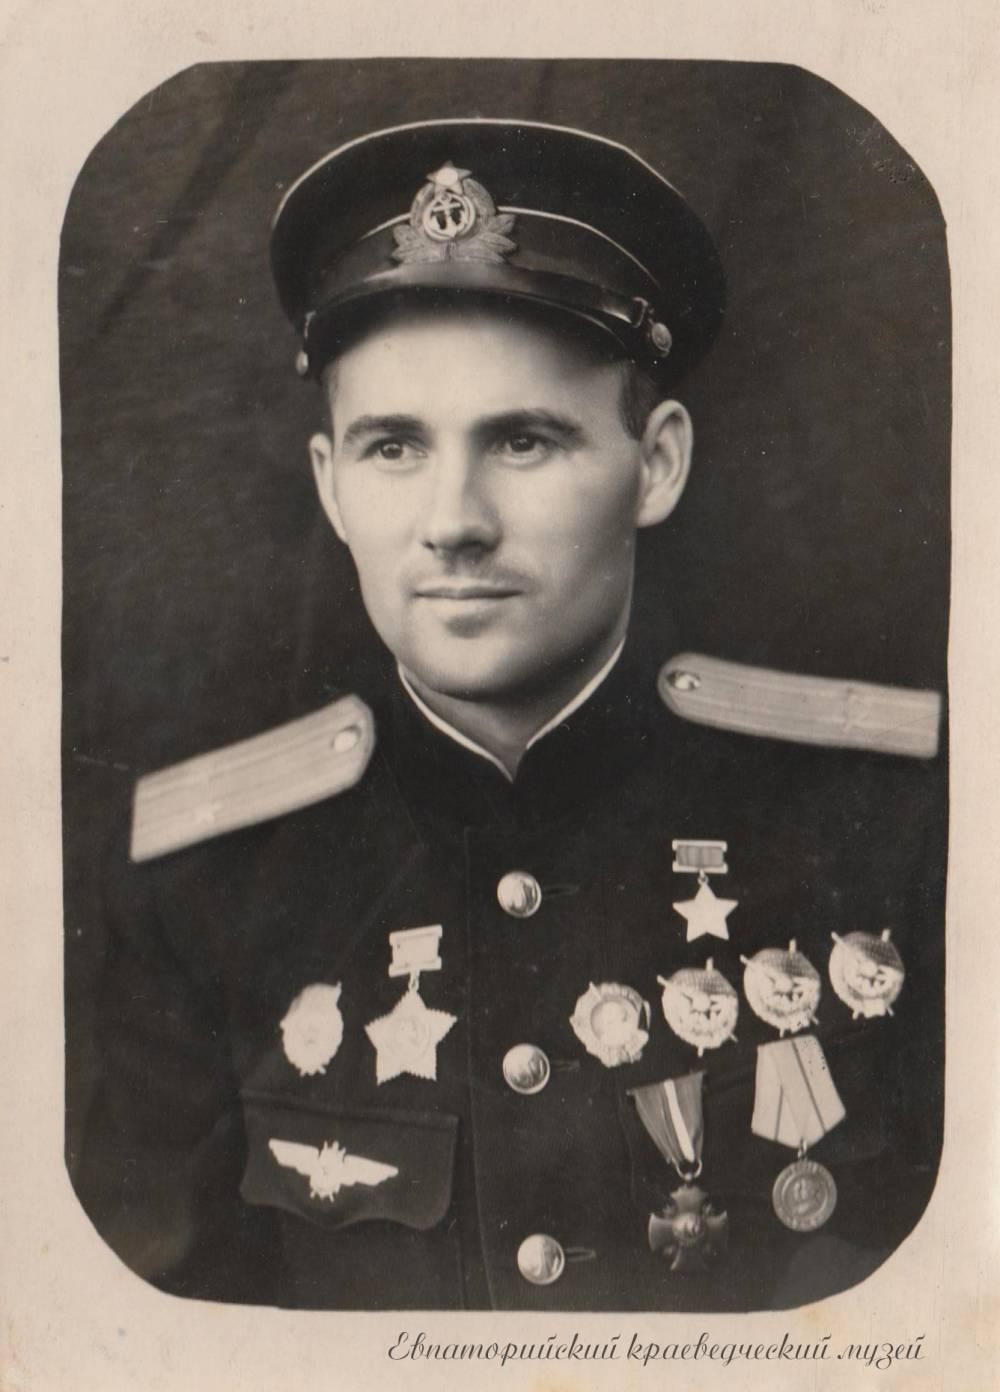 Авдеев Михаил Васильевич (1913-1979)